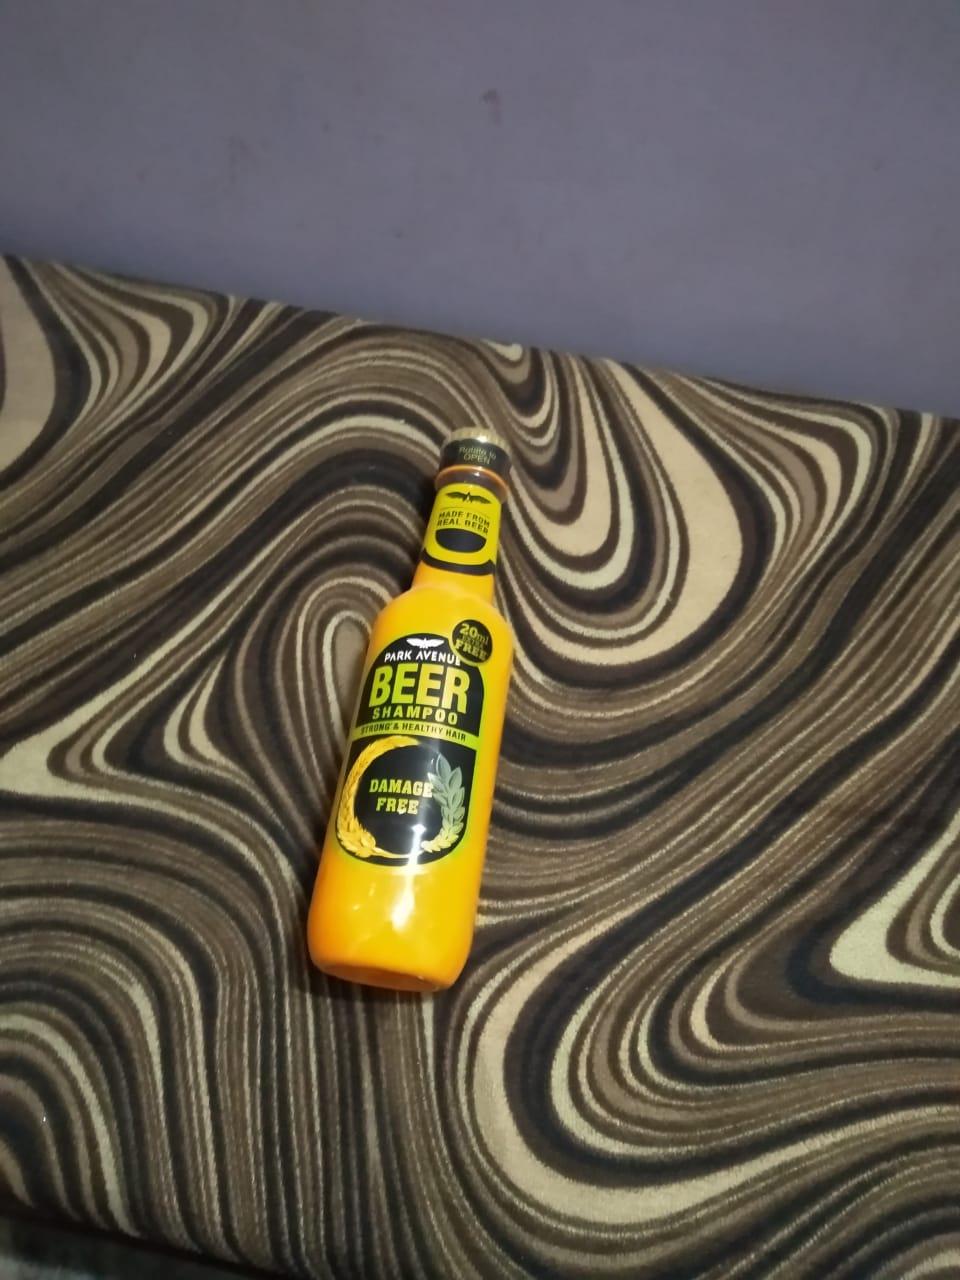 Park Avenue Beer Shampoo -Beer shampoo-By garimabagga